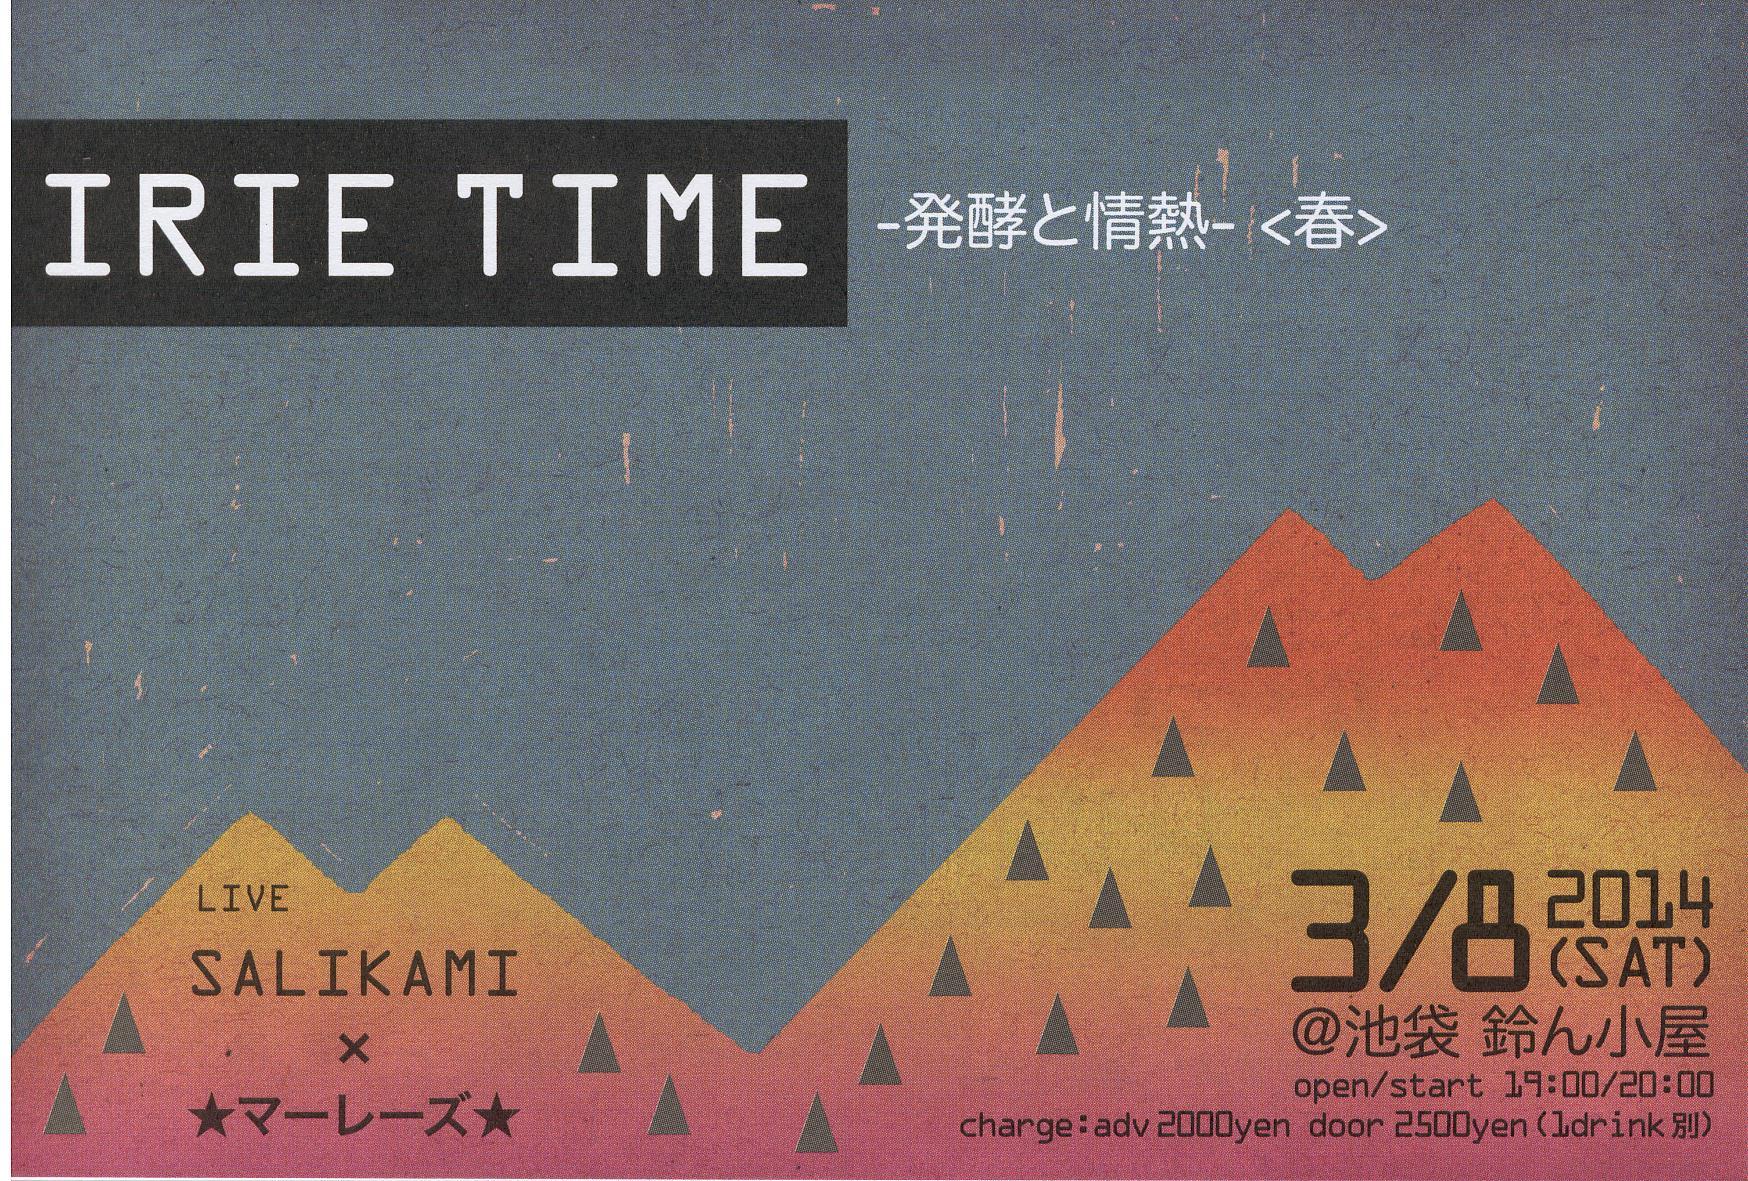 IRIE TIME 2014 3_8_omote0001.JPG